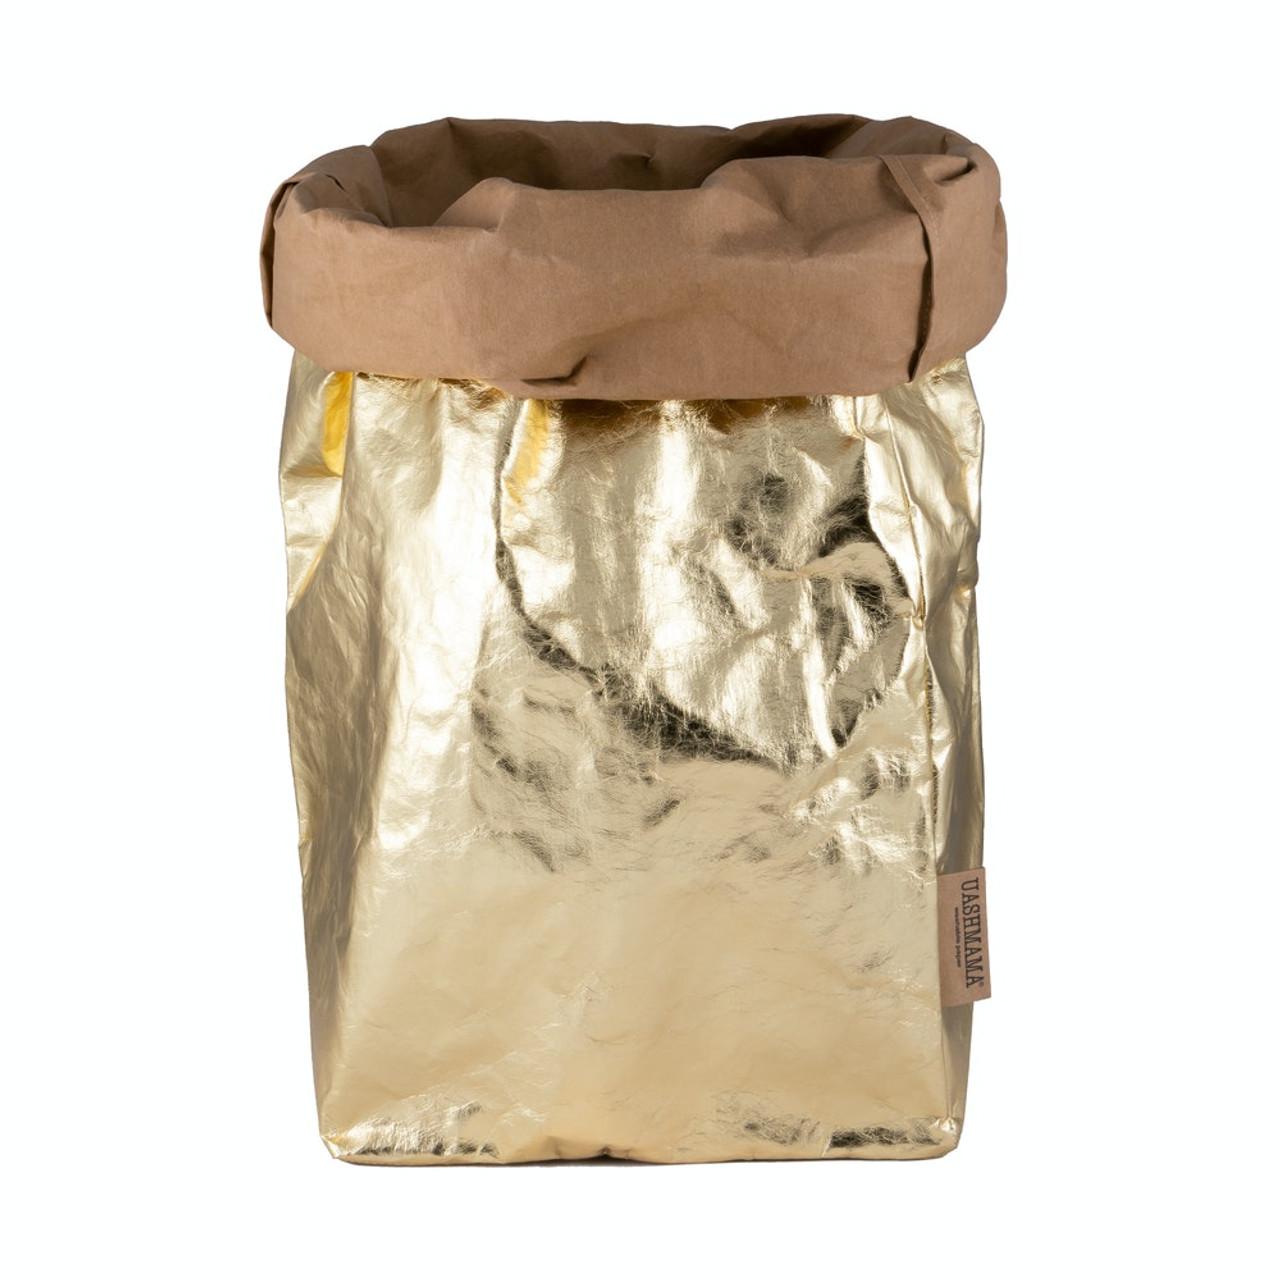 UASHMAMA xxl organic paper bags metallo avana gold